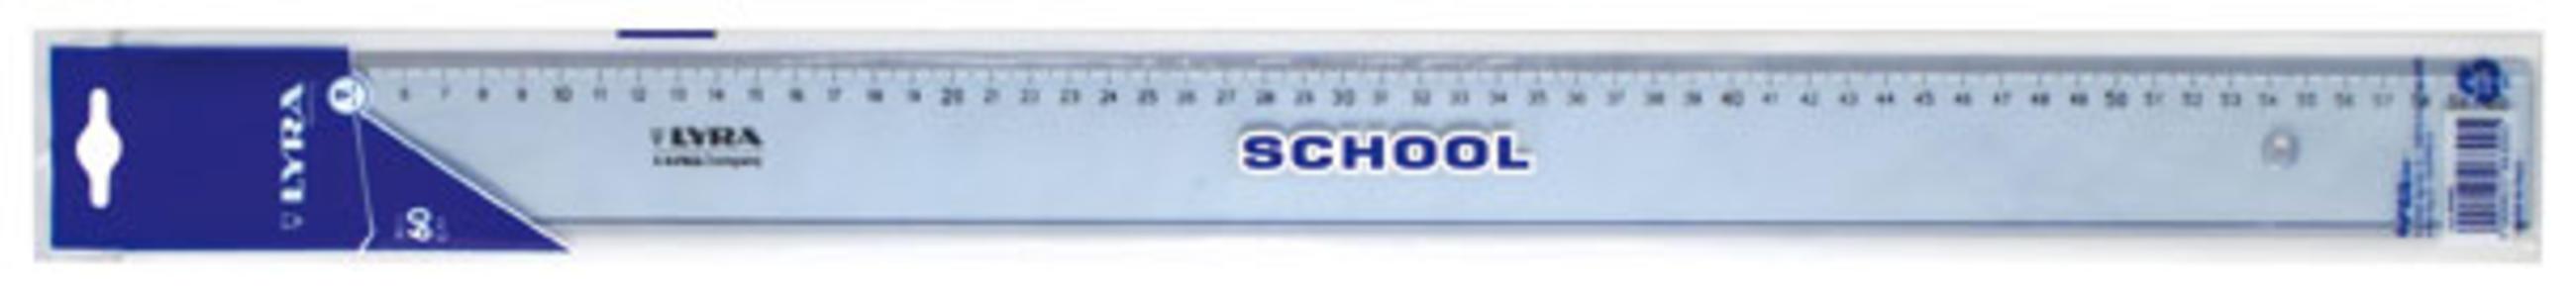 RIGA SCHOOL CM 60 FUME' LYRA SCHOOL - FILA